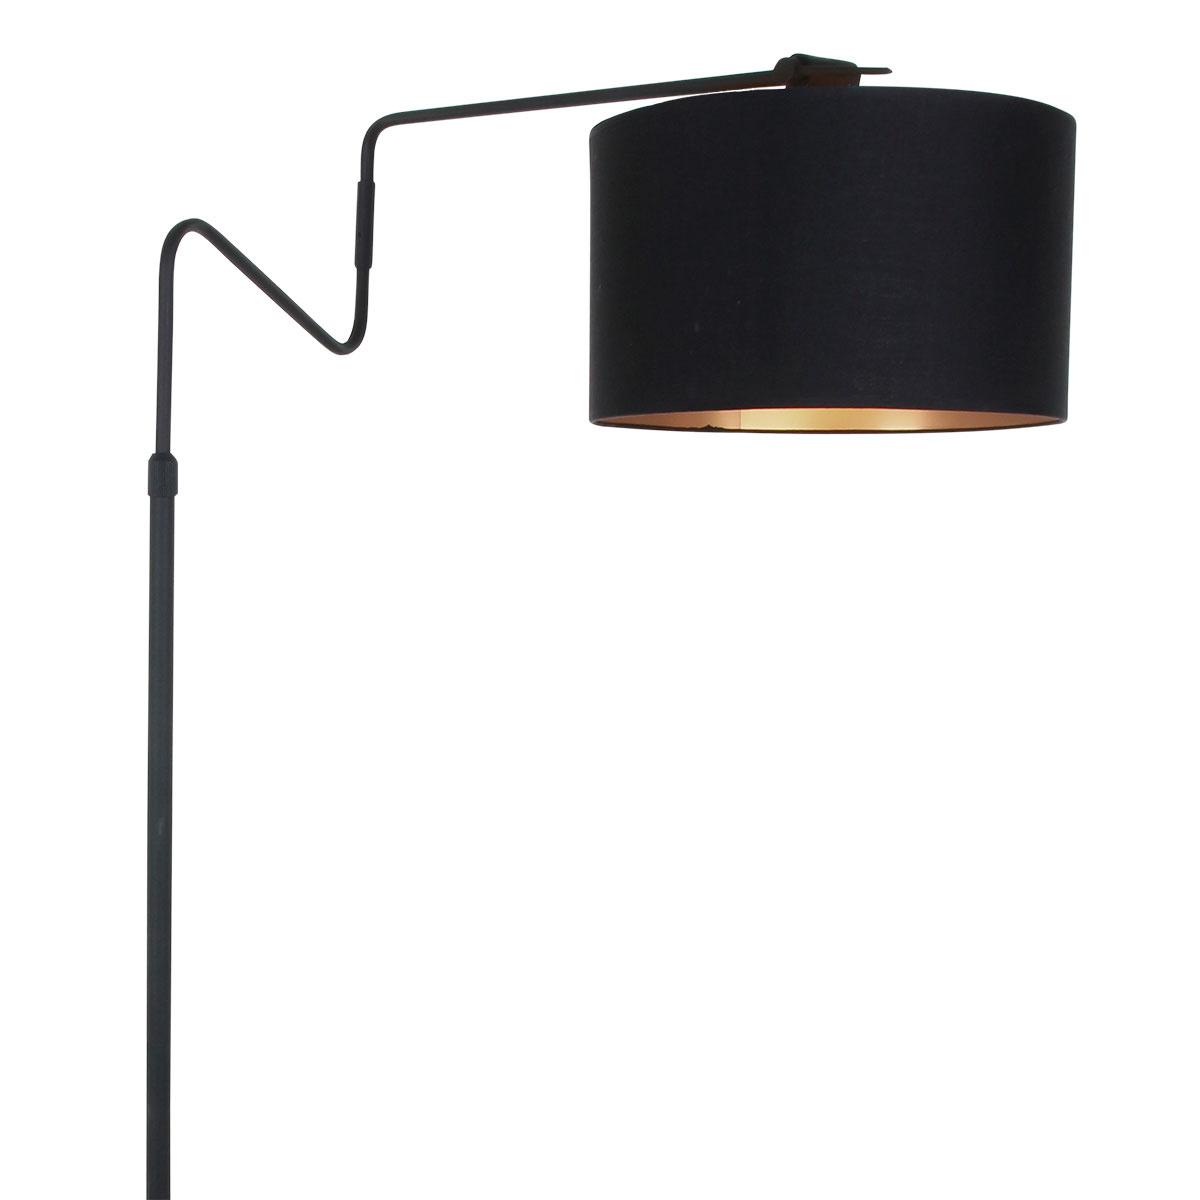 Anne Light & home Vloerlamp linstrom 2132zw zwart